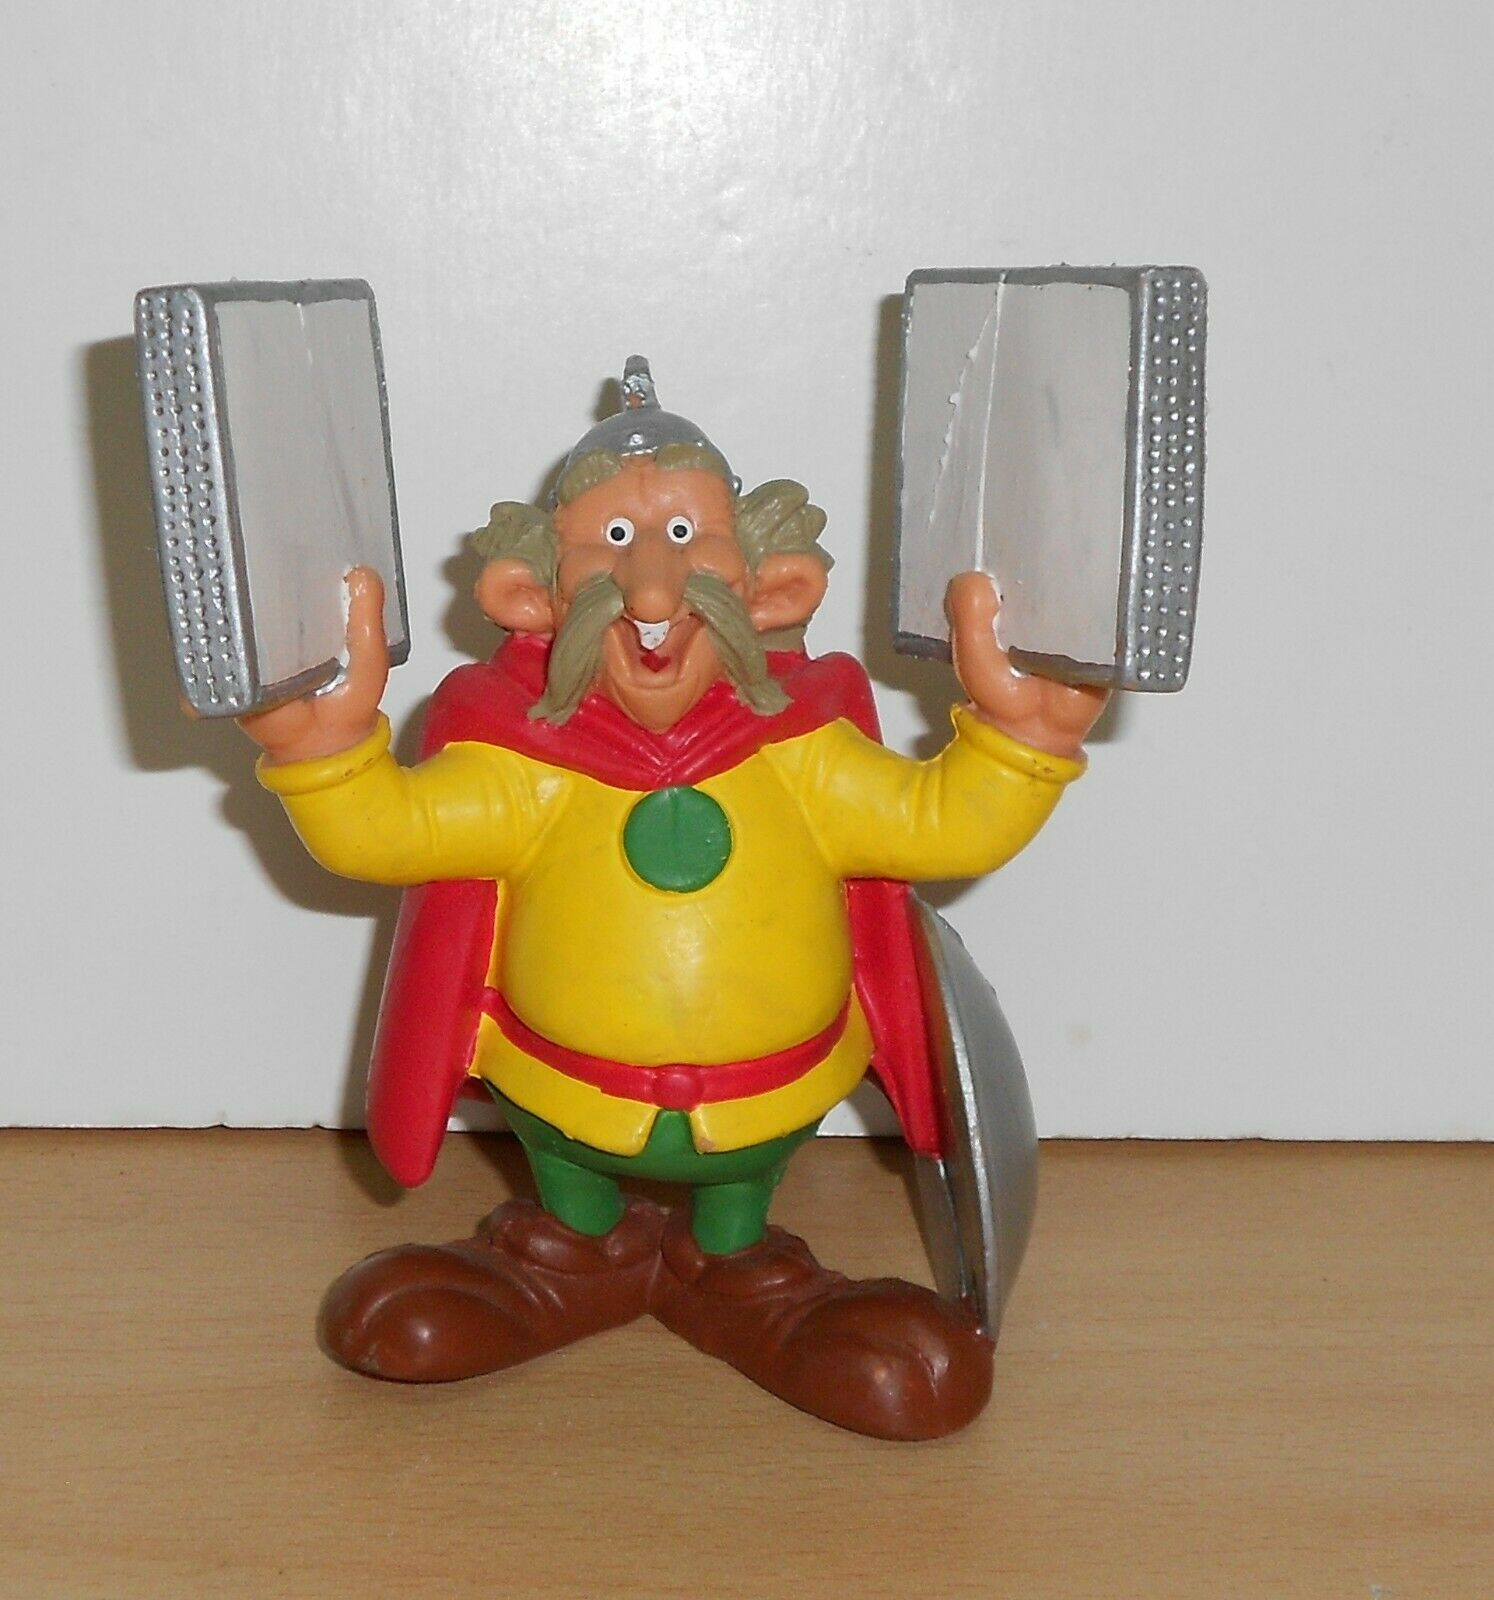 Asterix schleich ALPHACOUSTIC Figurine Figure ABRARACOURCIX 1979  - 11 11 11 CM ac2a6f